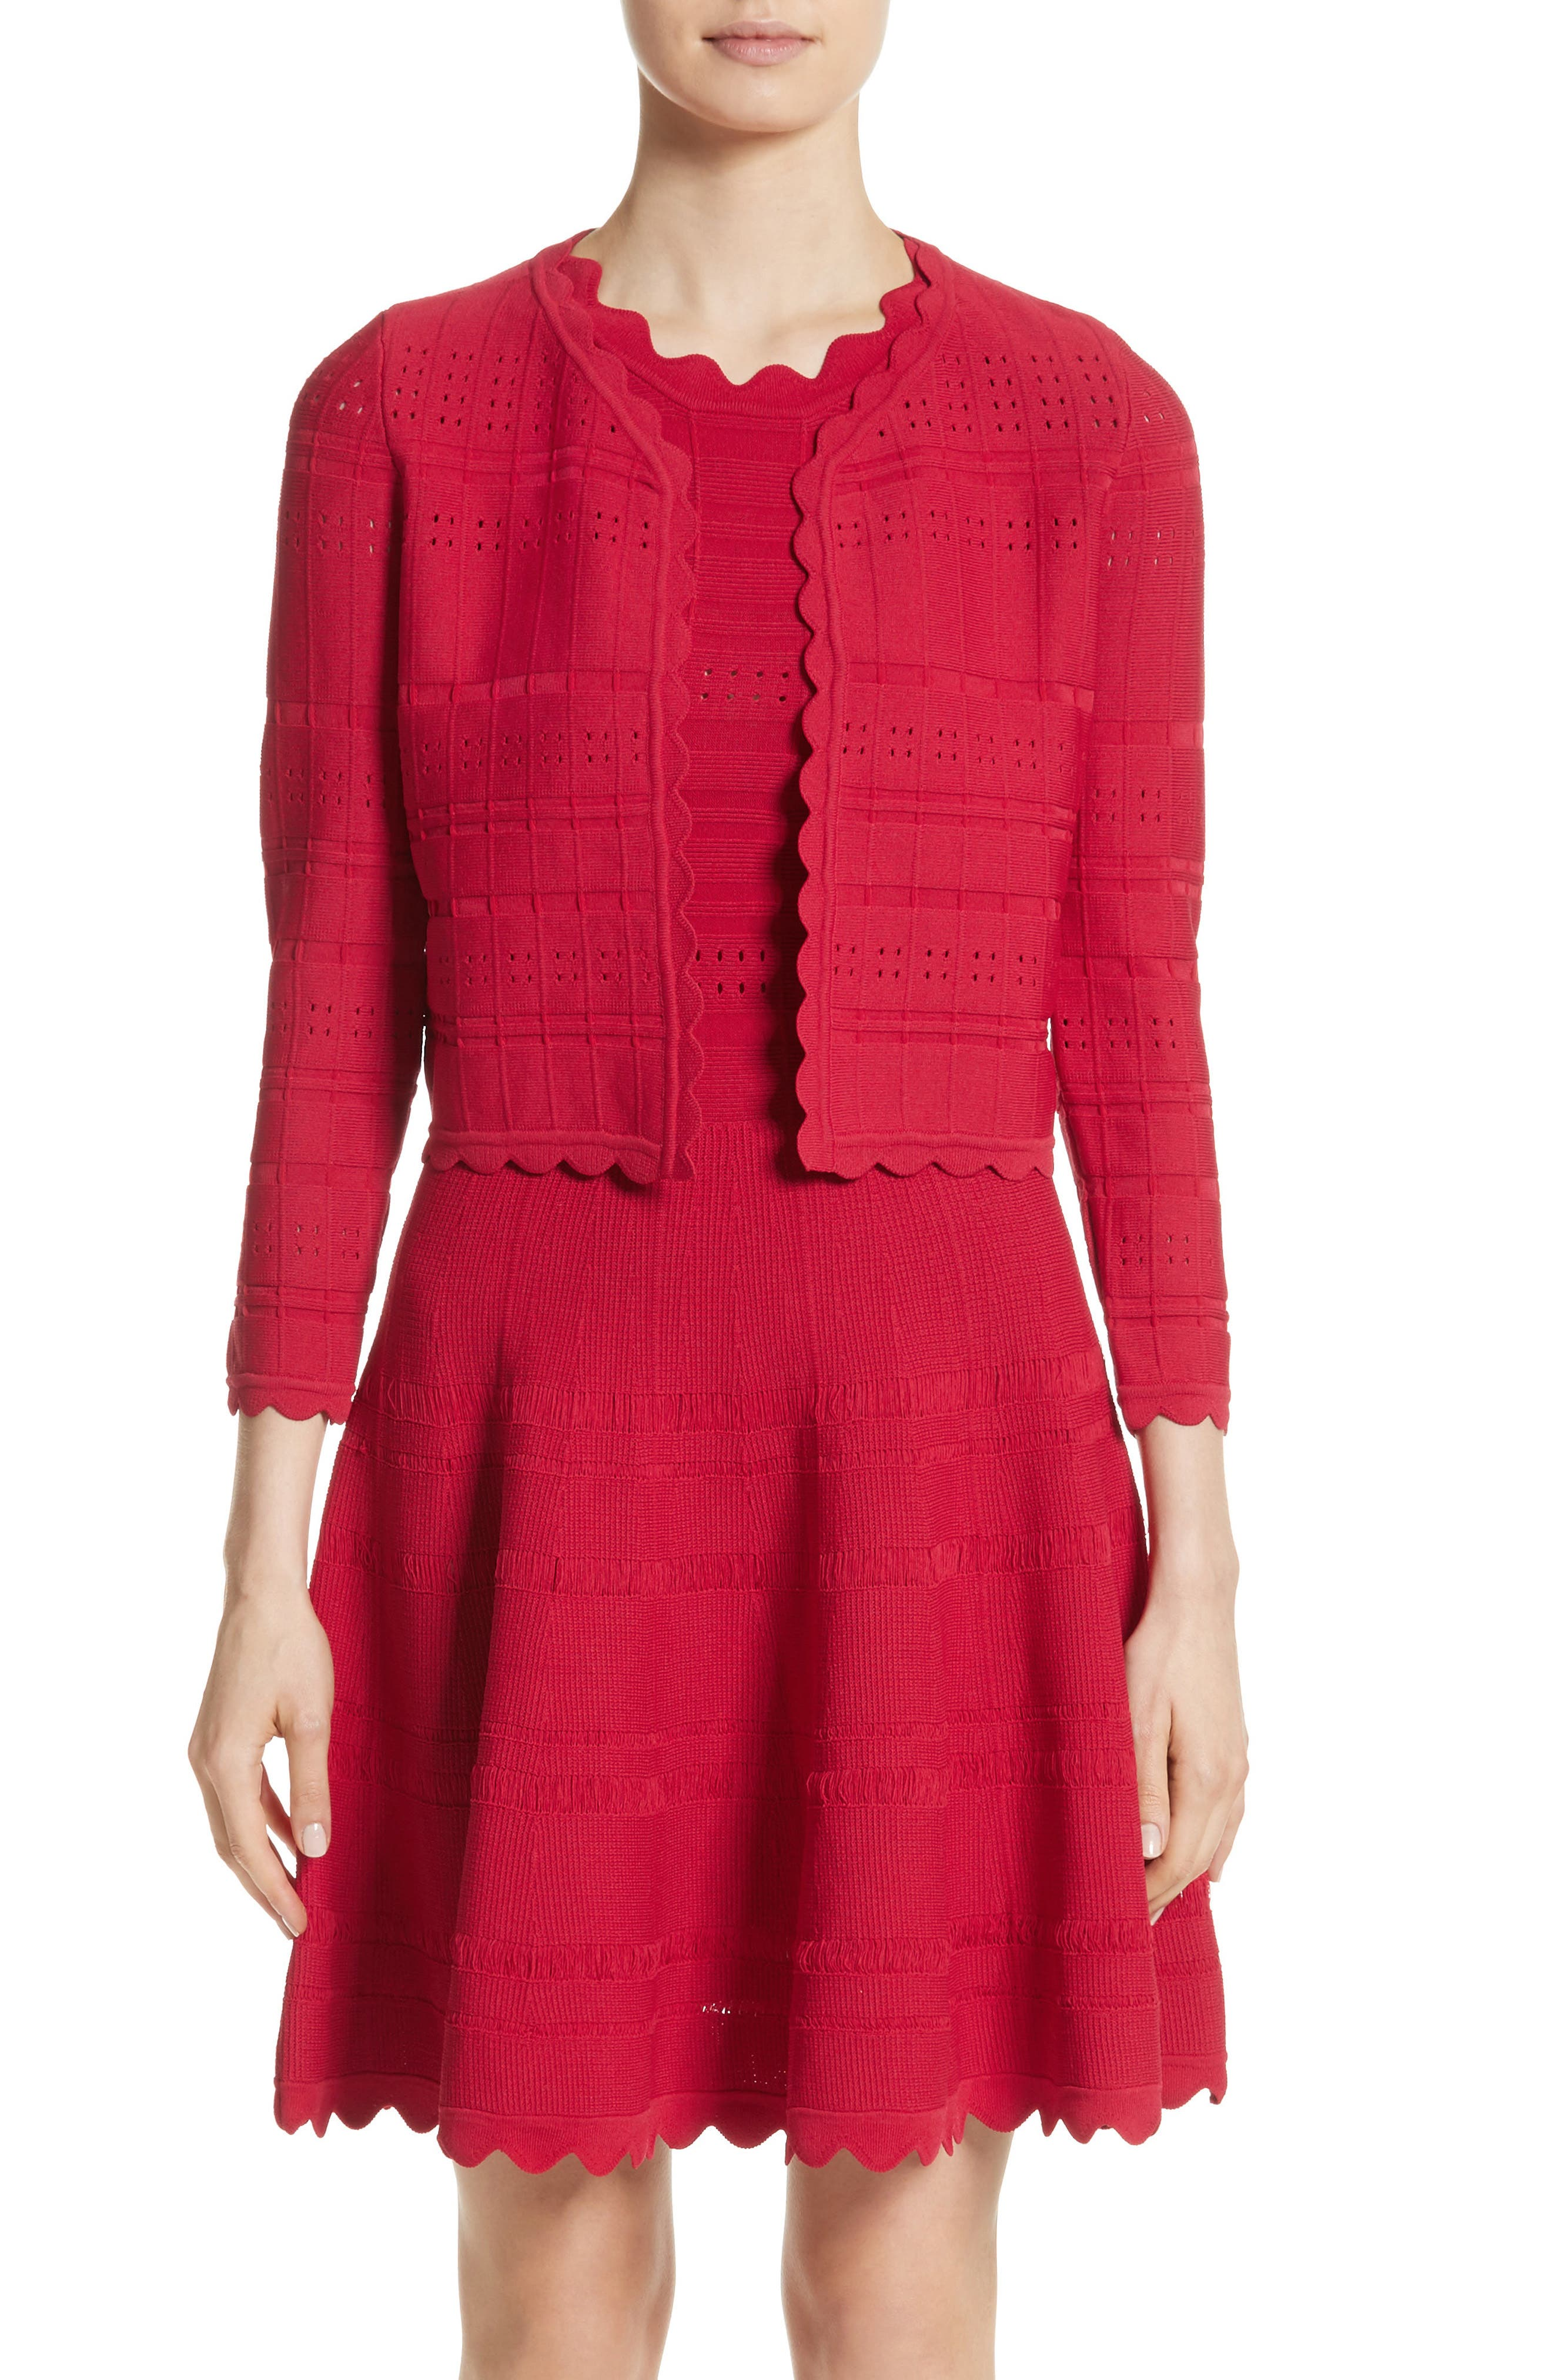 Scallop Trim Knit Dress,                             Alternate thumbnail 8, color,                             620